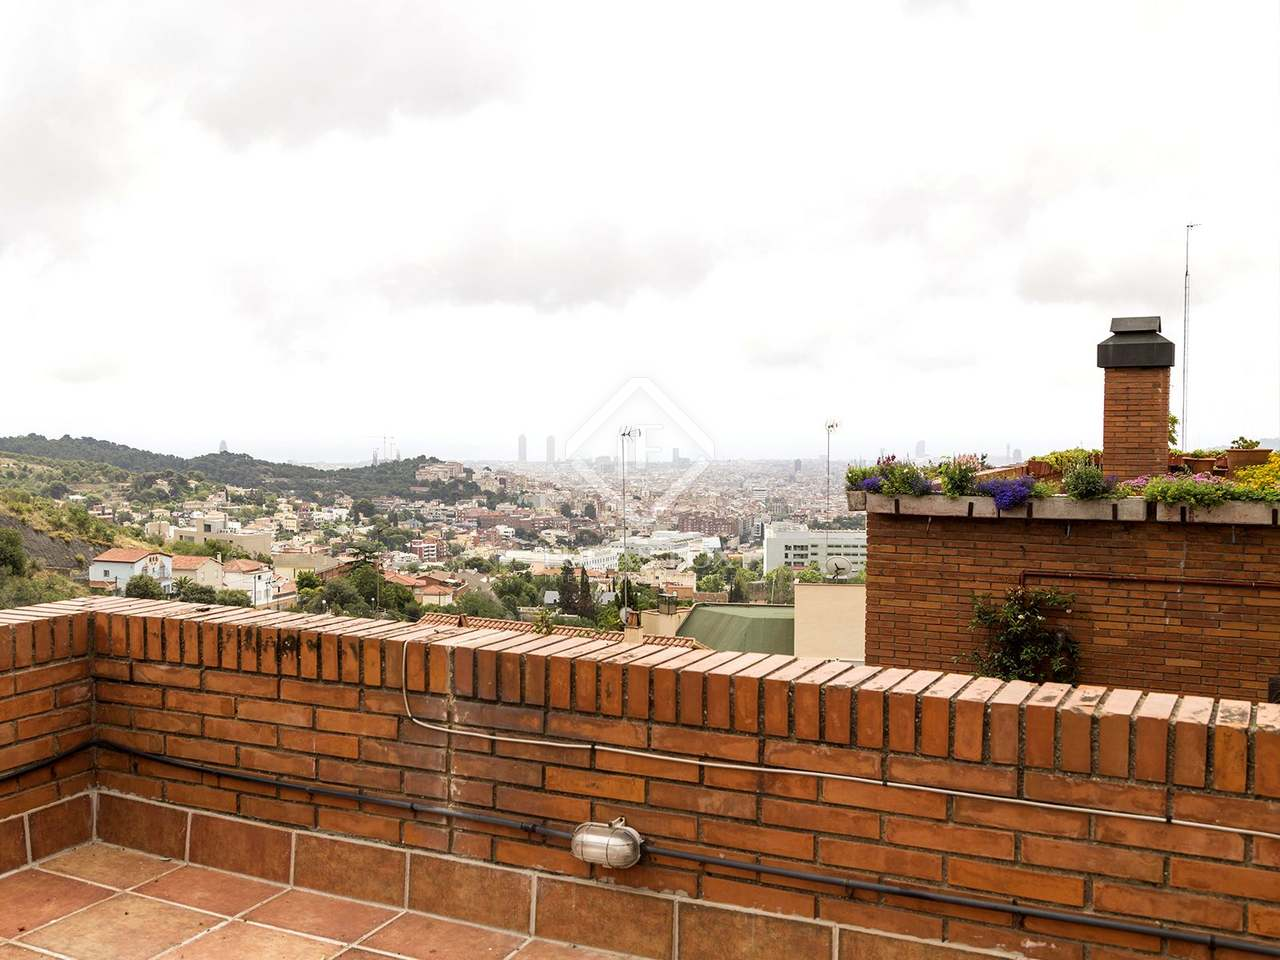 House for sale in barcelona 39 s exclusive zona alta - Zona alta barcelona ...